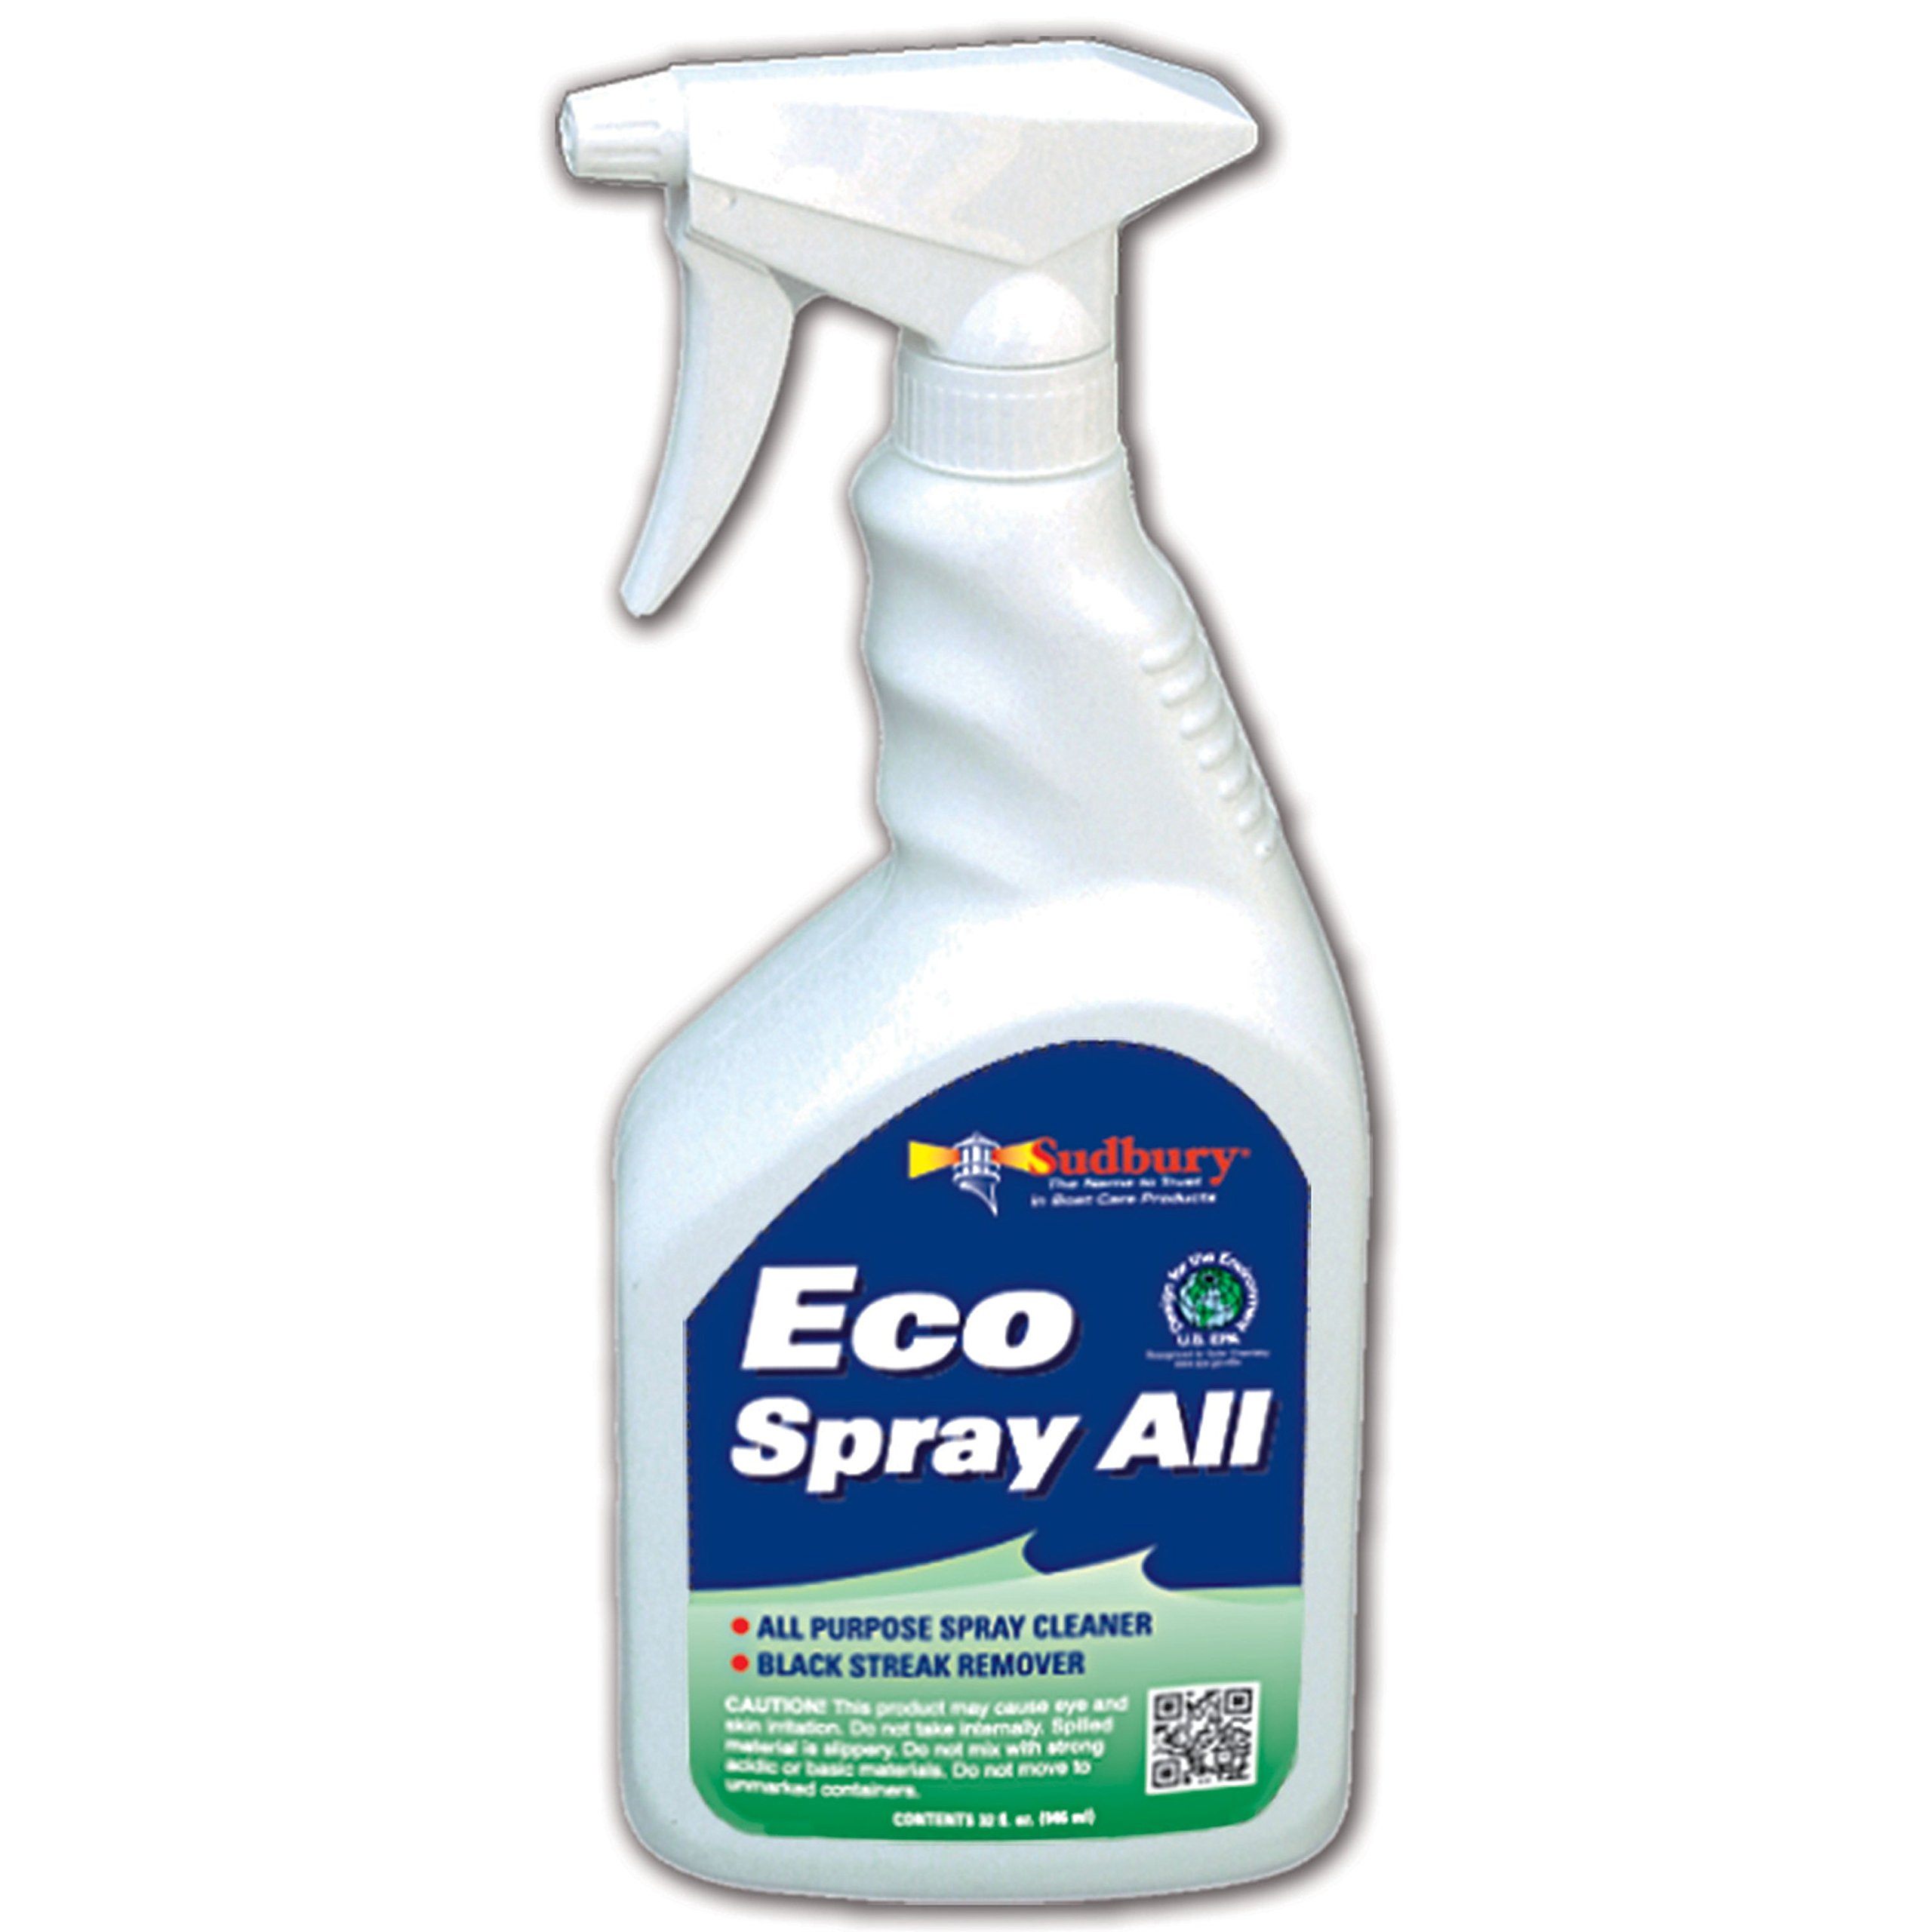 Sudbury 847Q Eco Spray All and Black Streak Remover